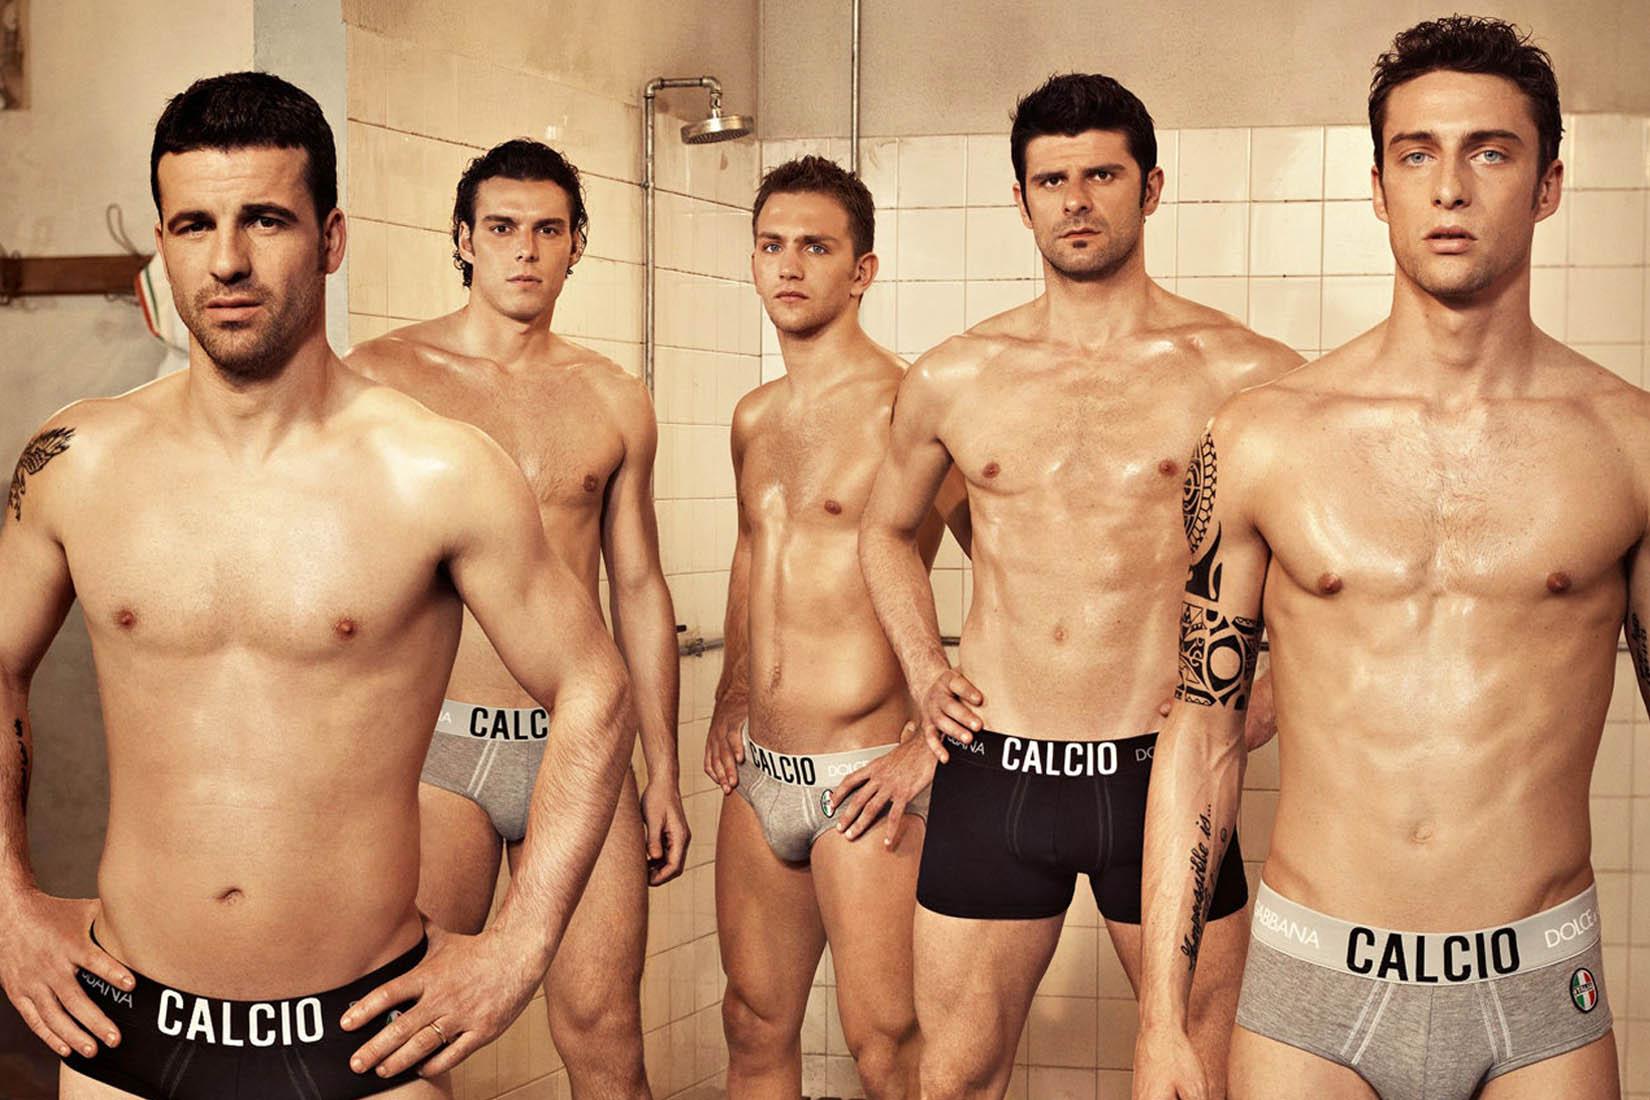 best underwear men dolce and gabbana review Luxe Digital